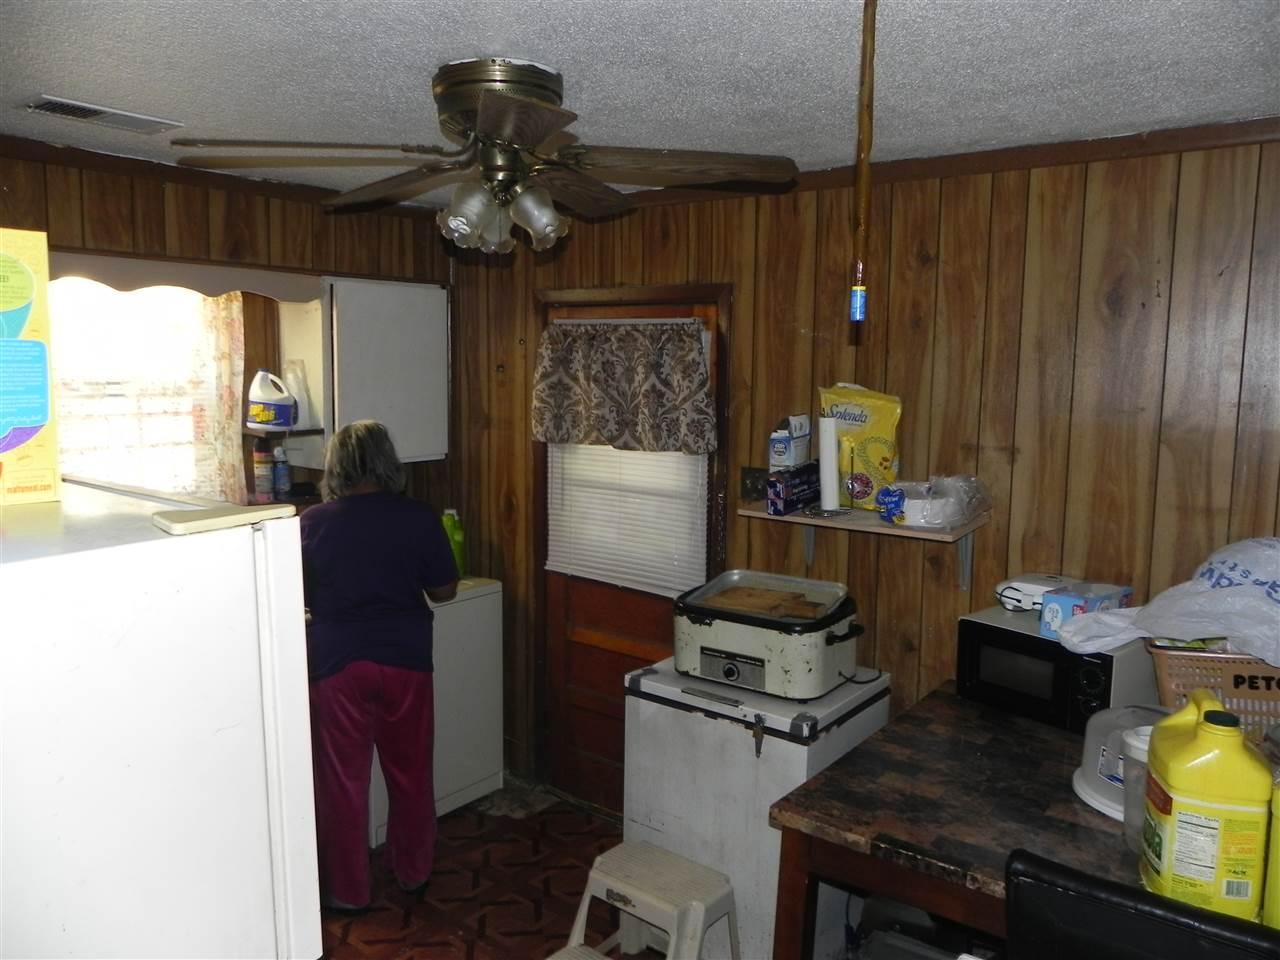 2849 Choctaw Memphis, TN 38114 - MLS #: 10020484